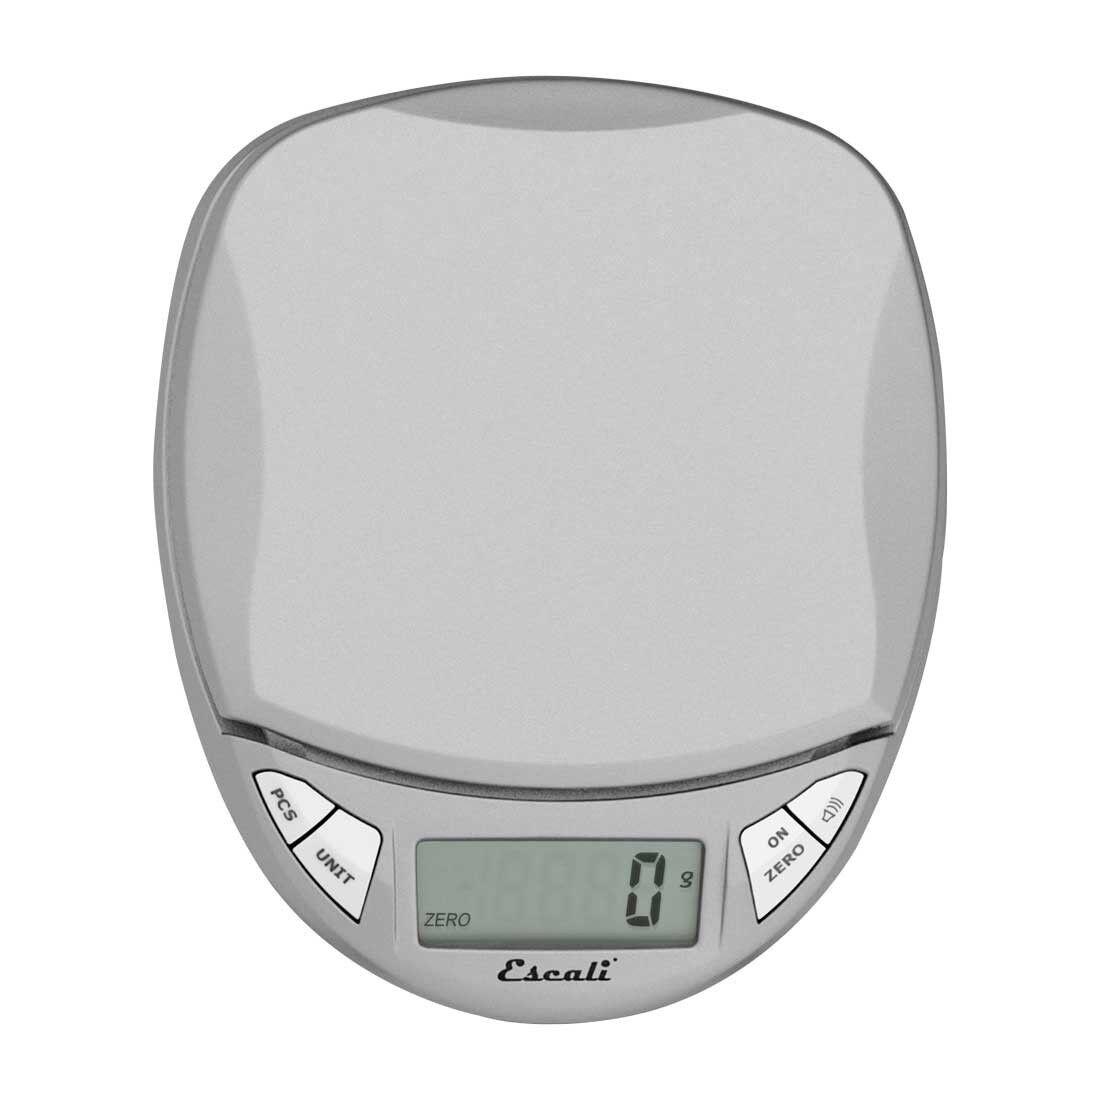 Escali Pico Digital Scale Kitchen Office 11 Lb/5 Kg Silver Accurate N115S